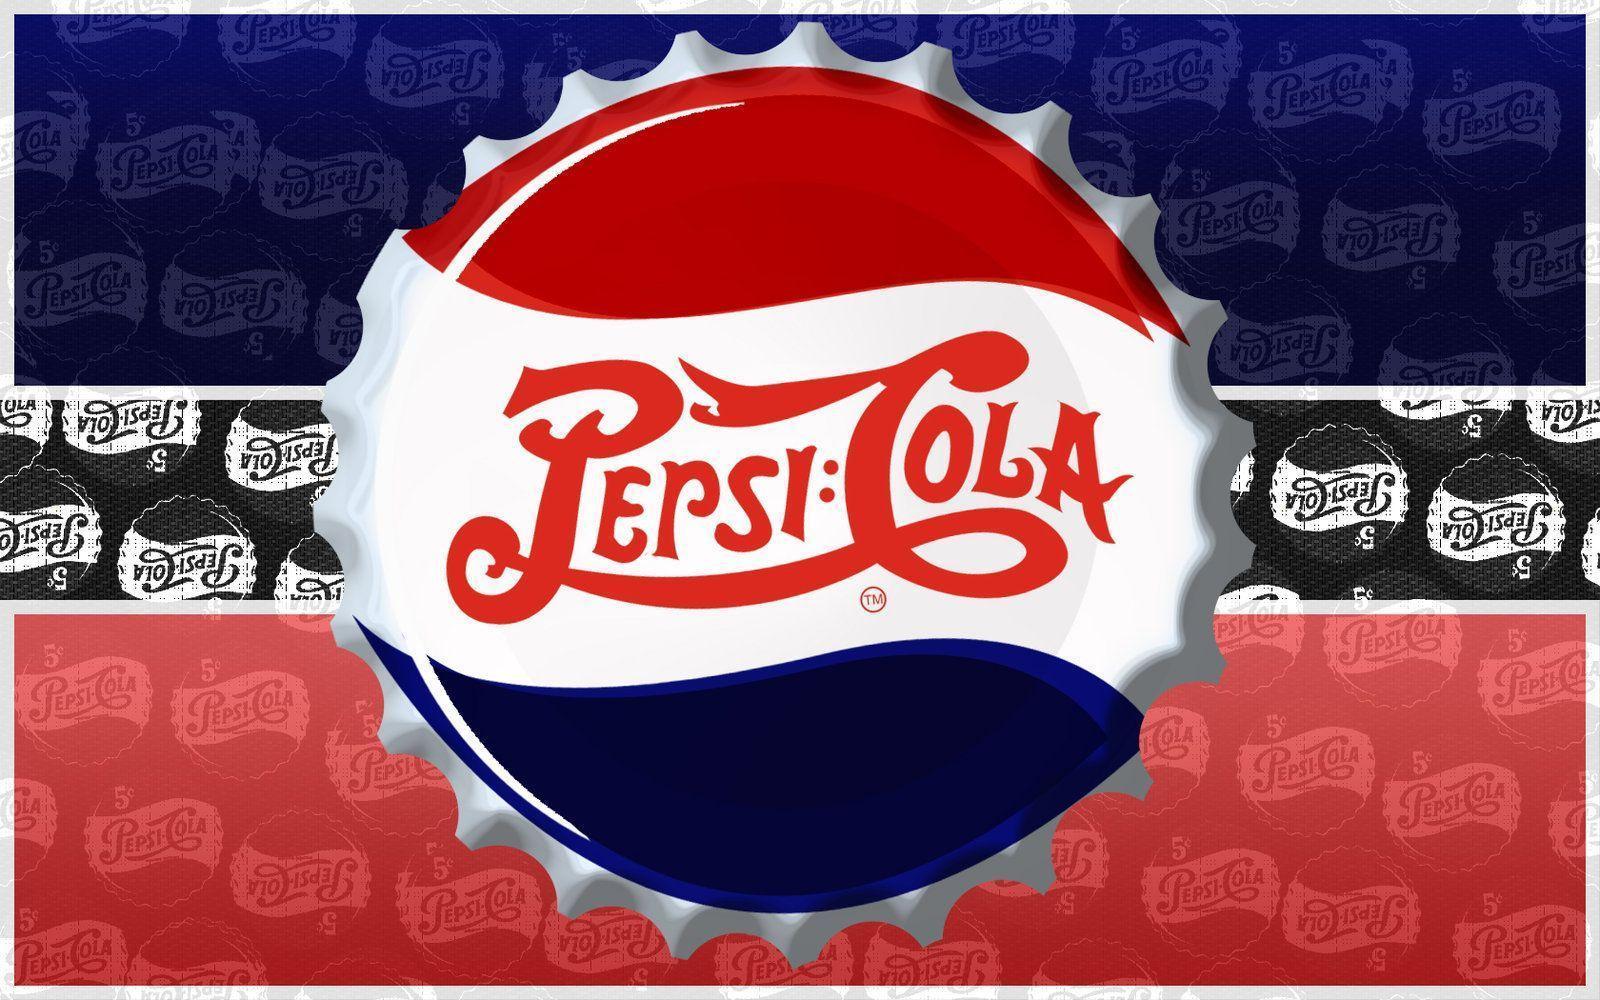 Pepsi Cola Wallpapers 1600x1000